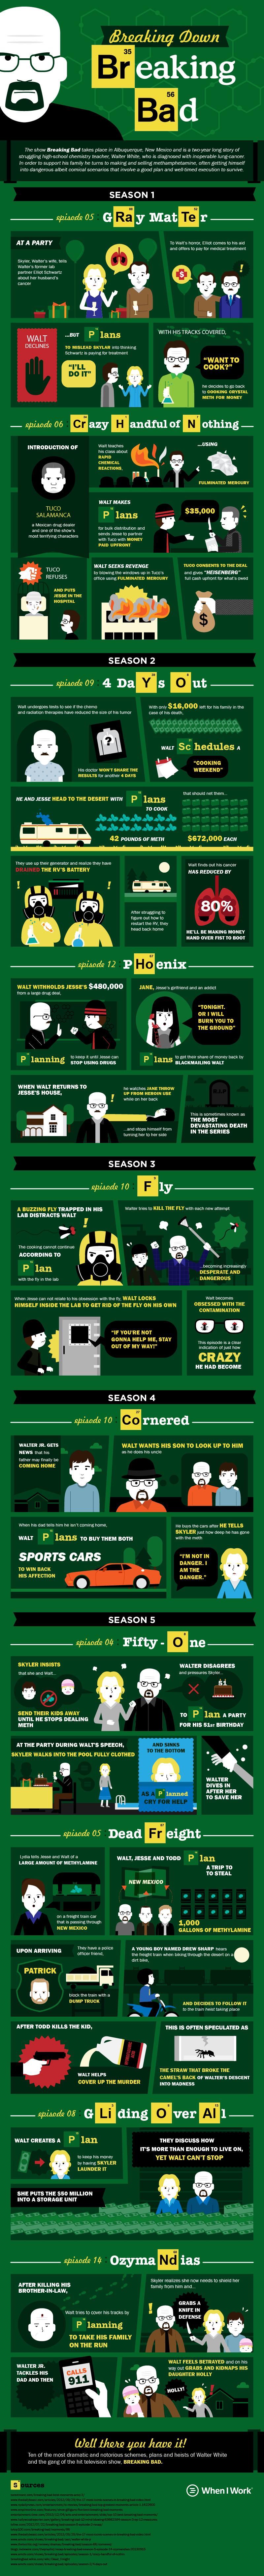 Breaking Down Breaking Bad Infographic Breaking Bad Breaking Bad Series Breakin Bad